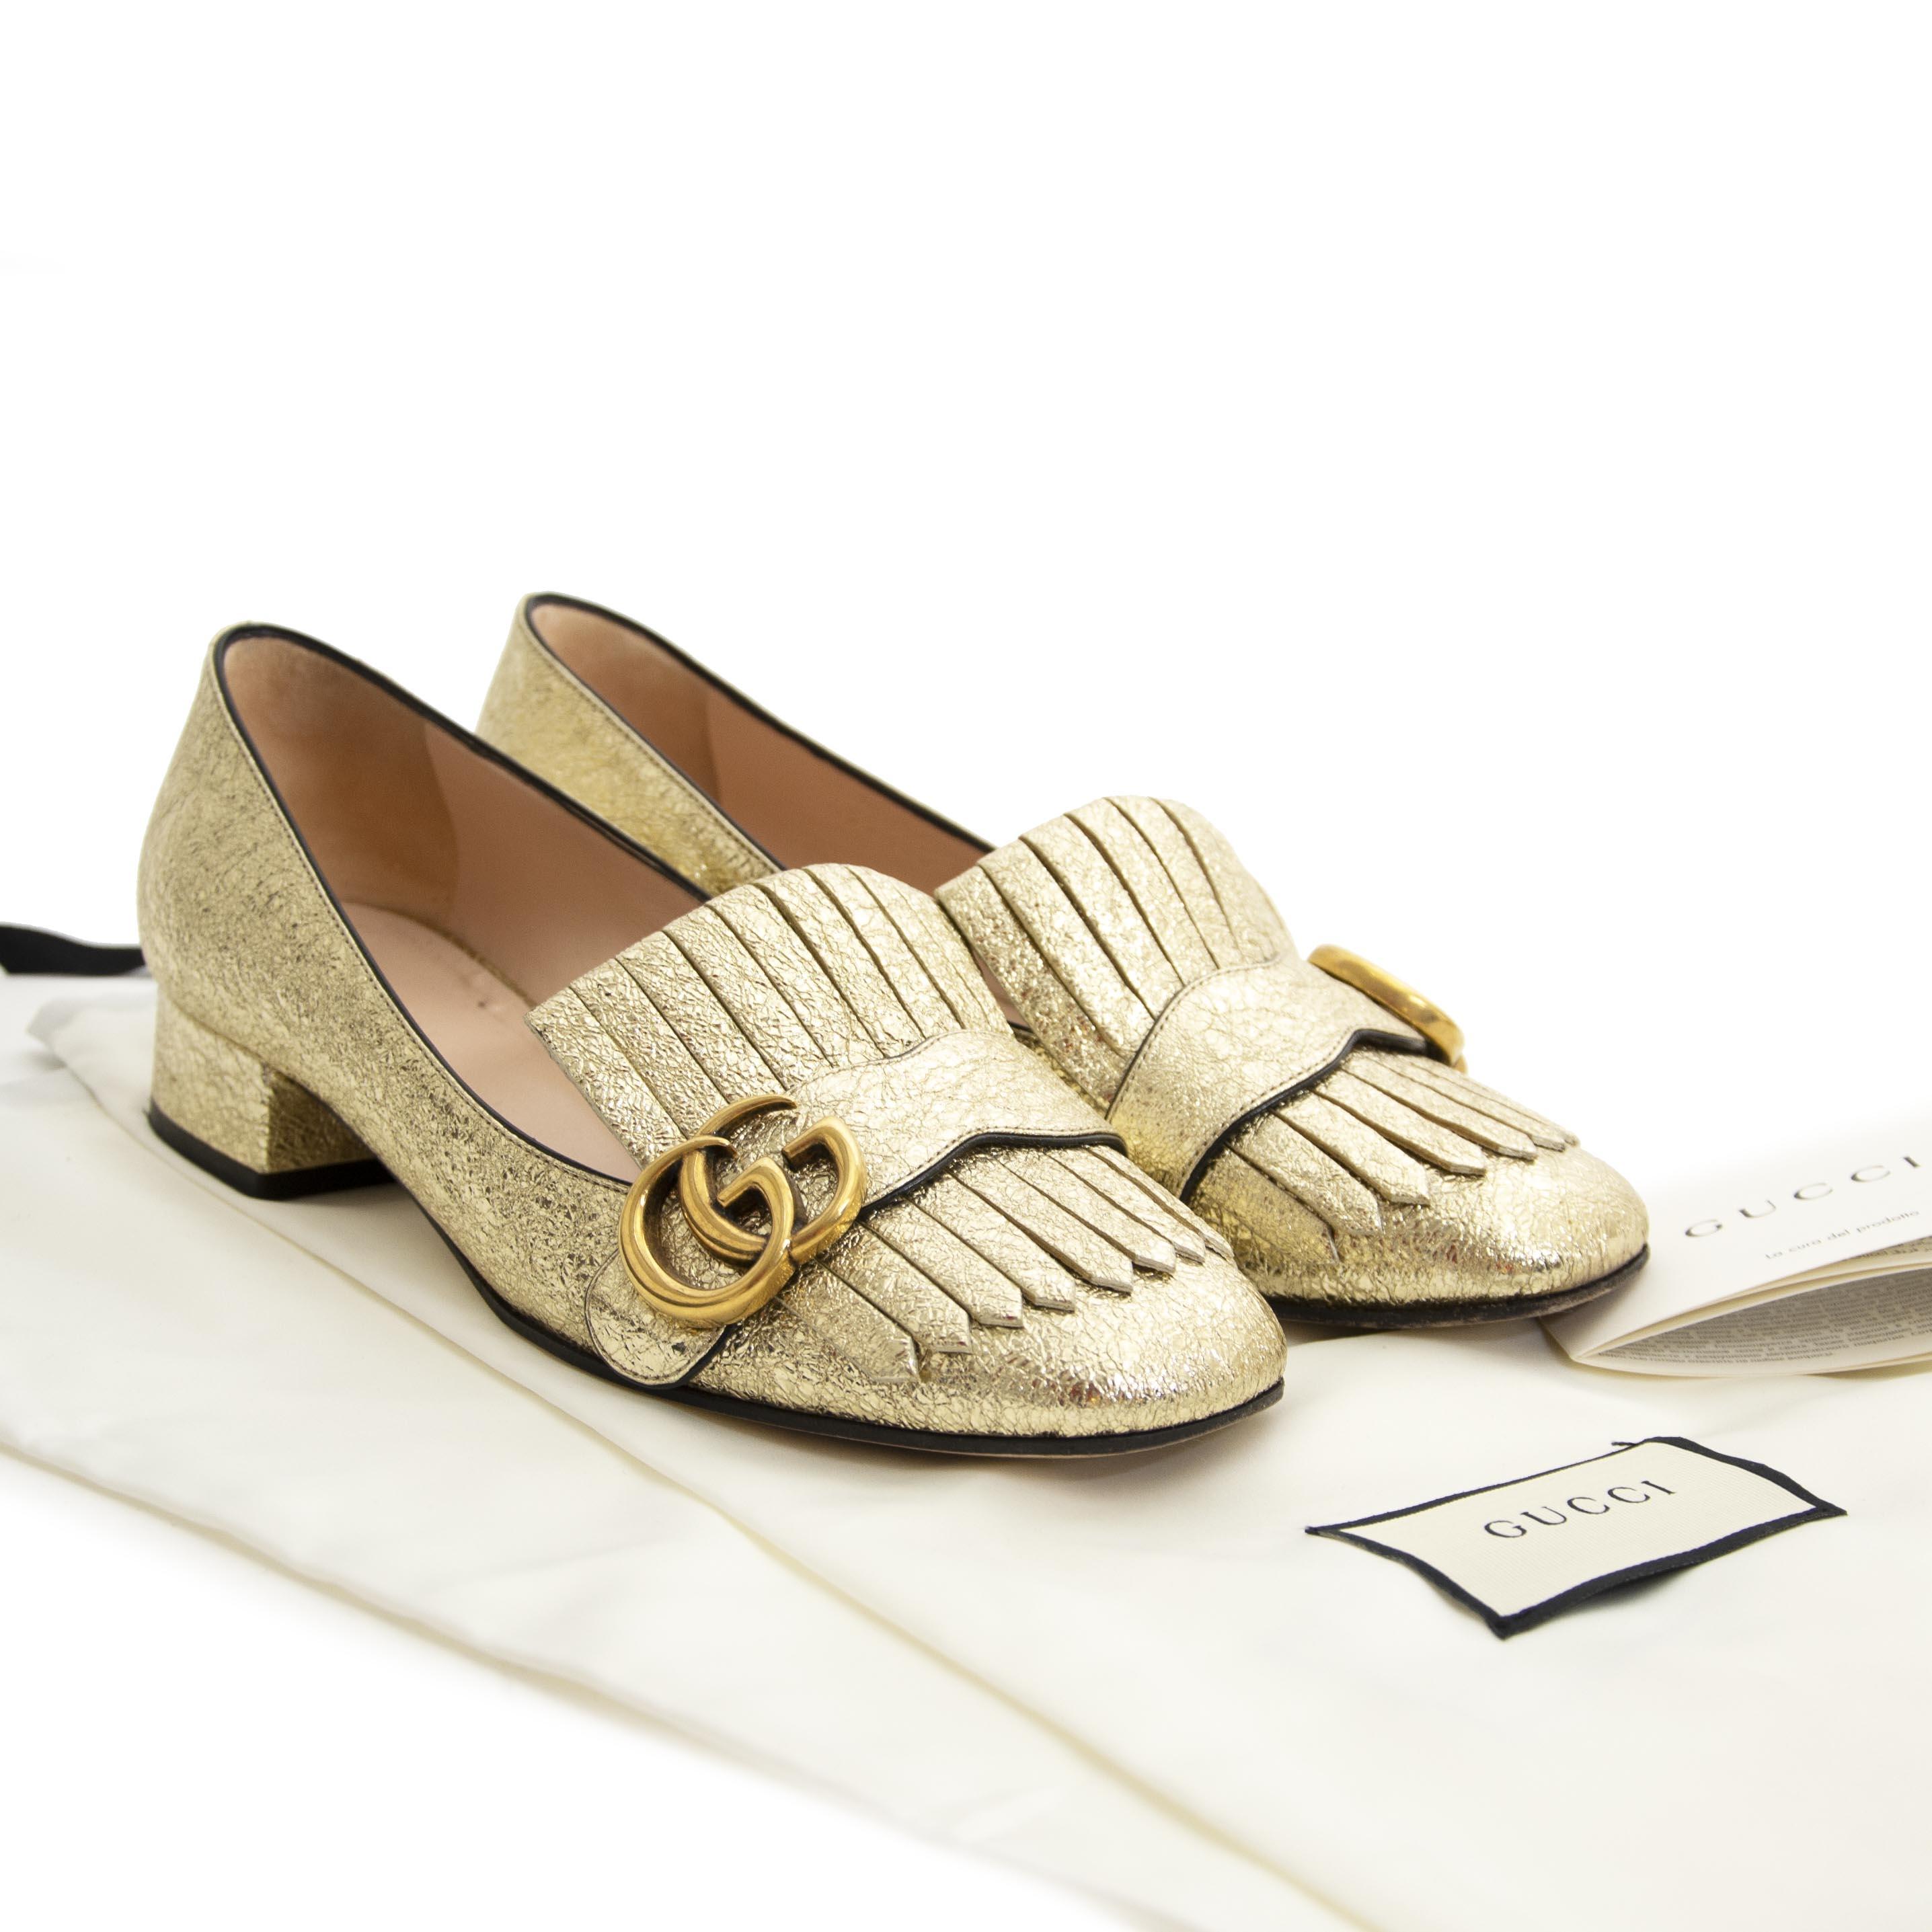 Gucci Marmont Gold Metallic Pumps - size 37  online tegen de beste prijs